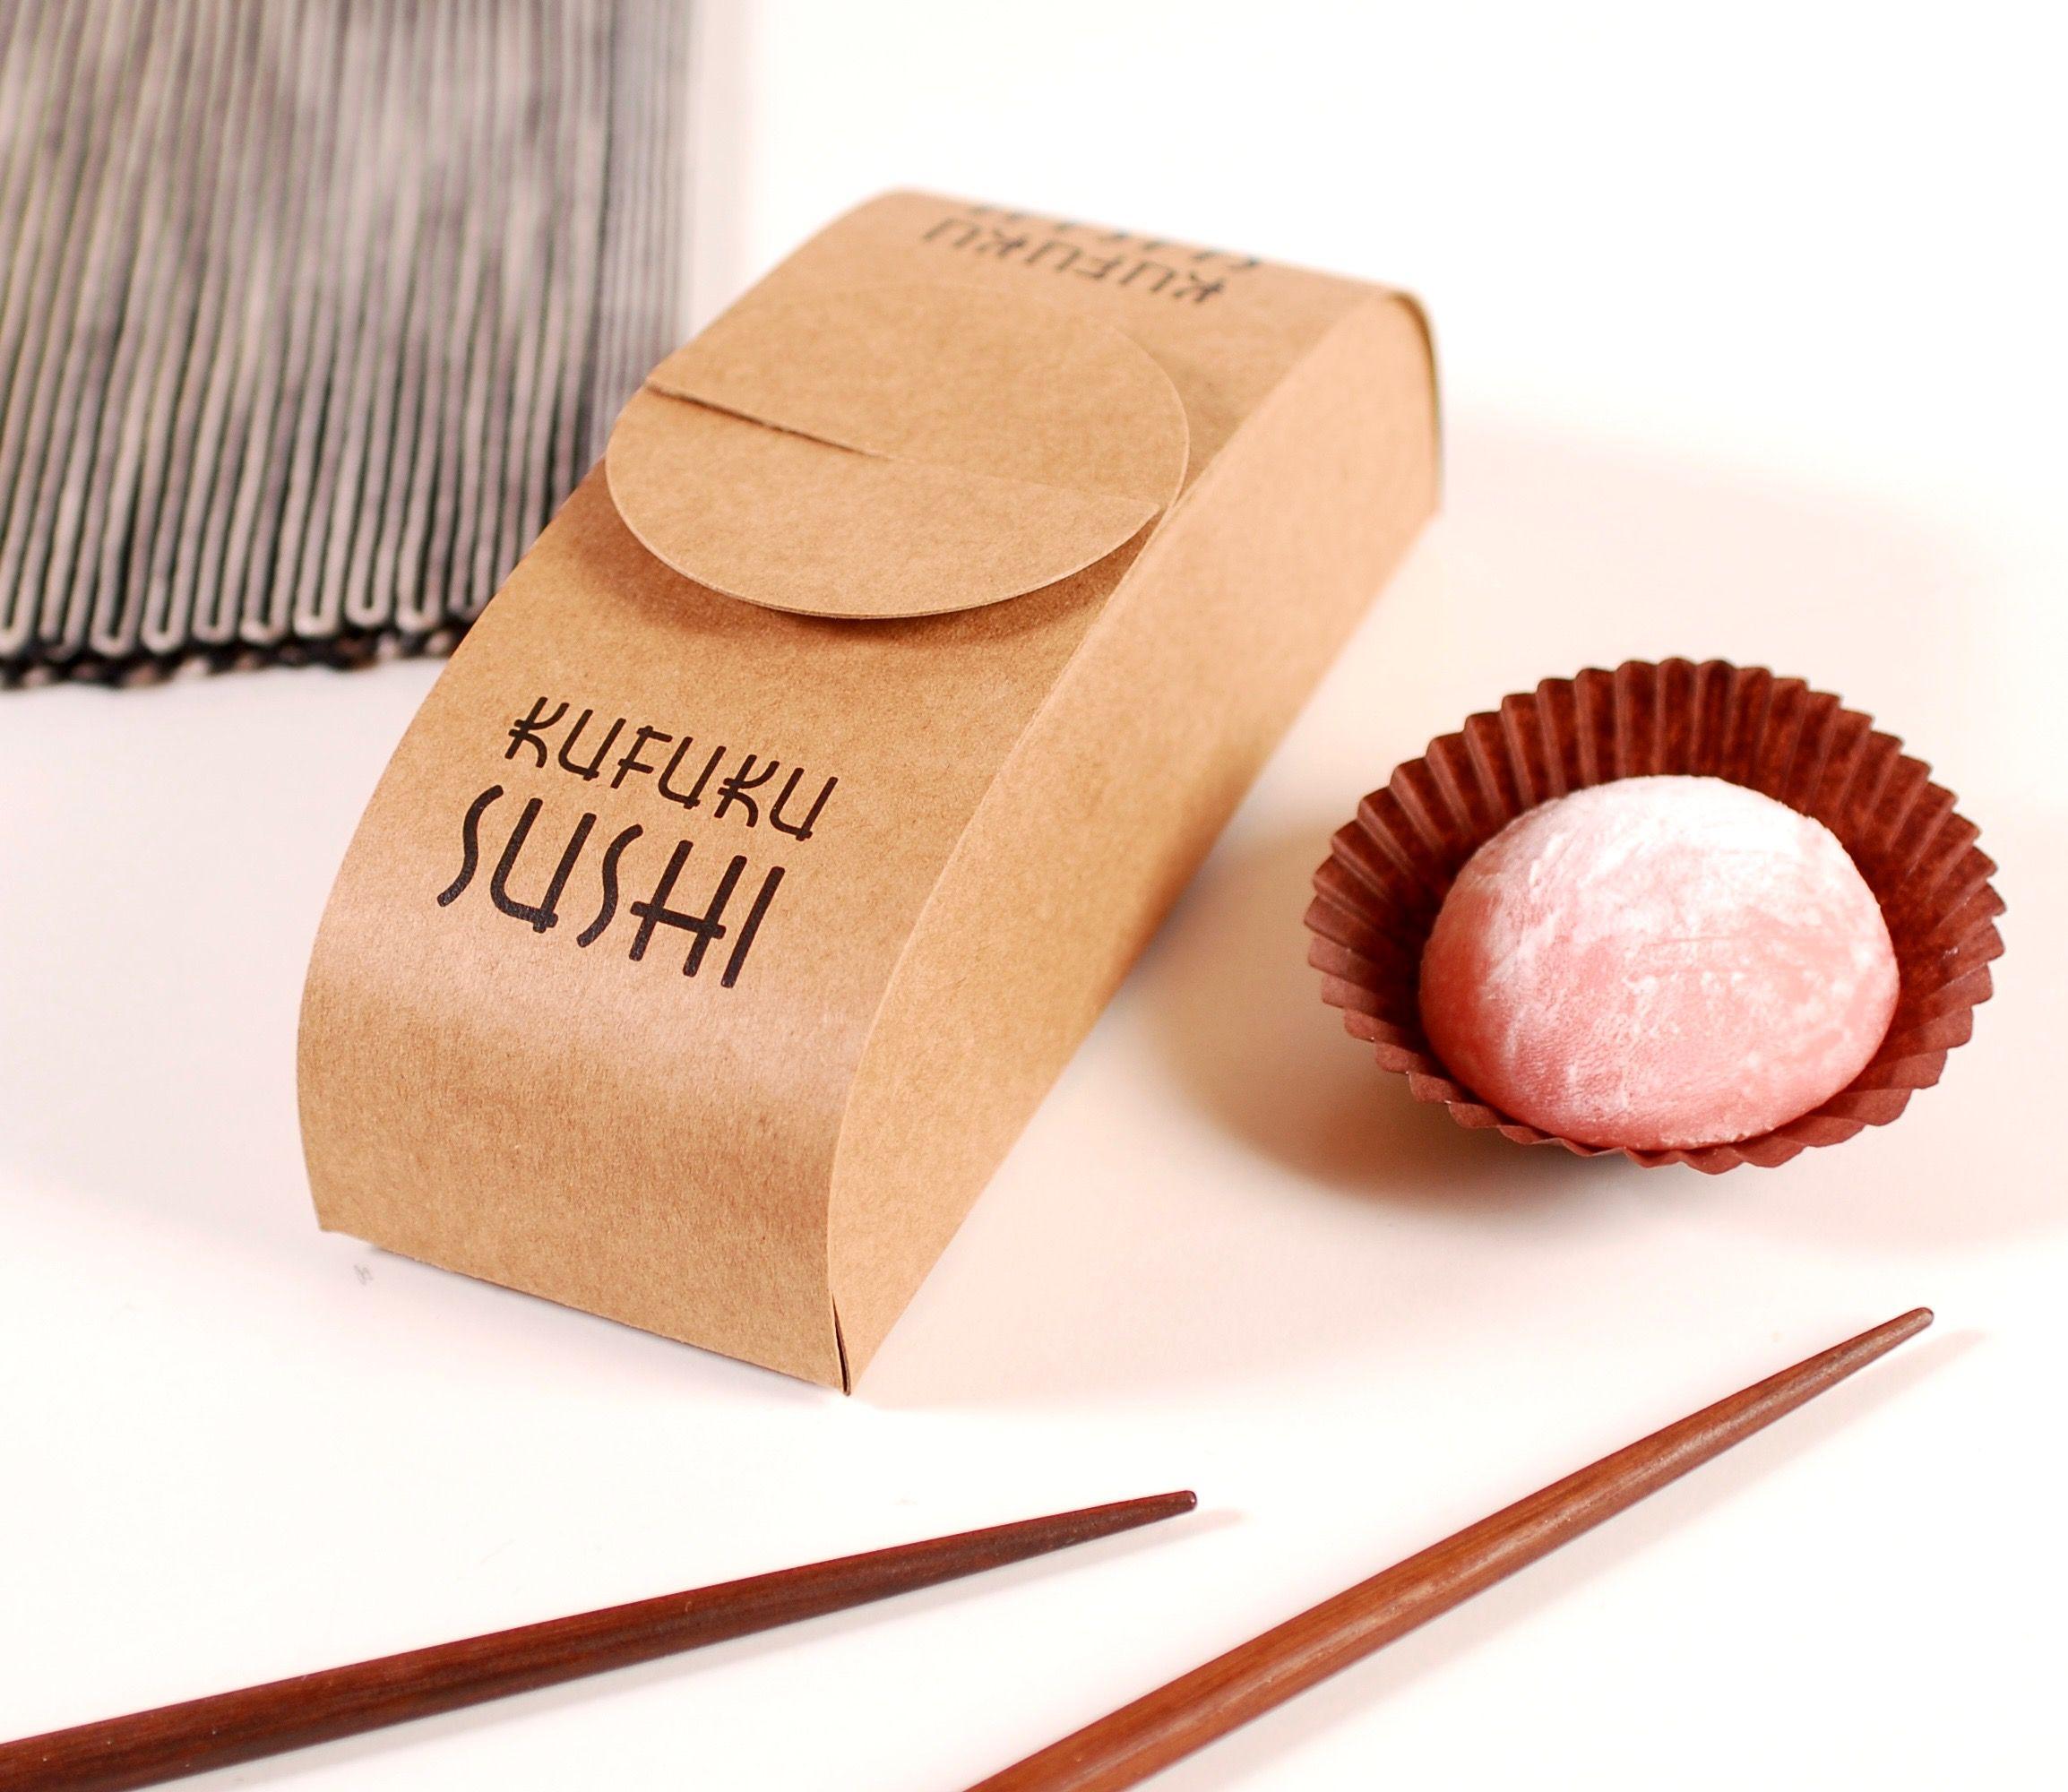 Cajas De Cartón Para Sushi Cajas De Dulces Japoneses Dulces Japoneses Postres Japoneses